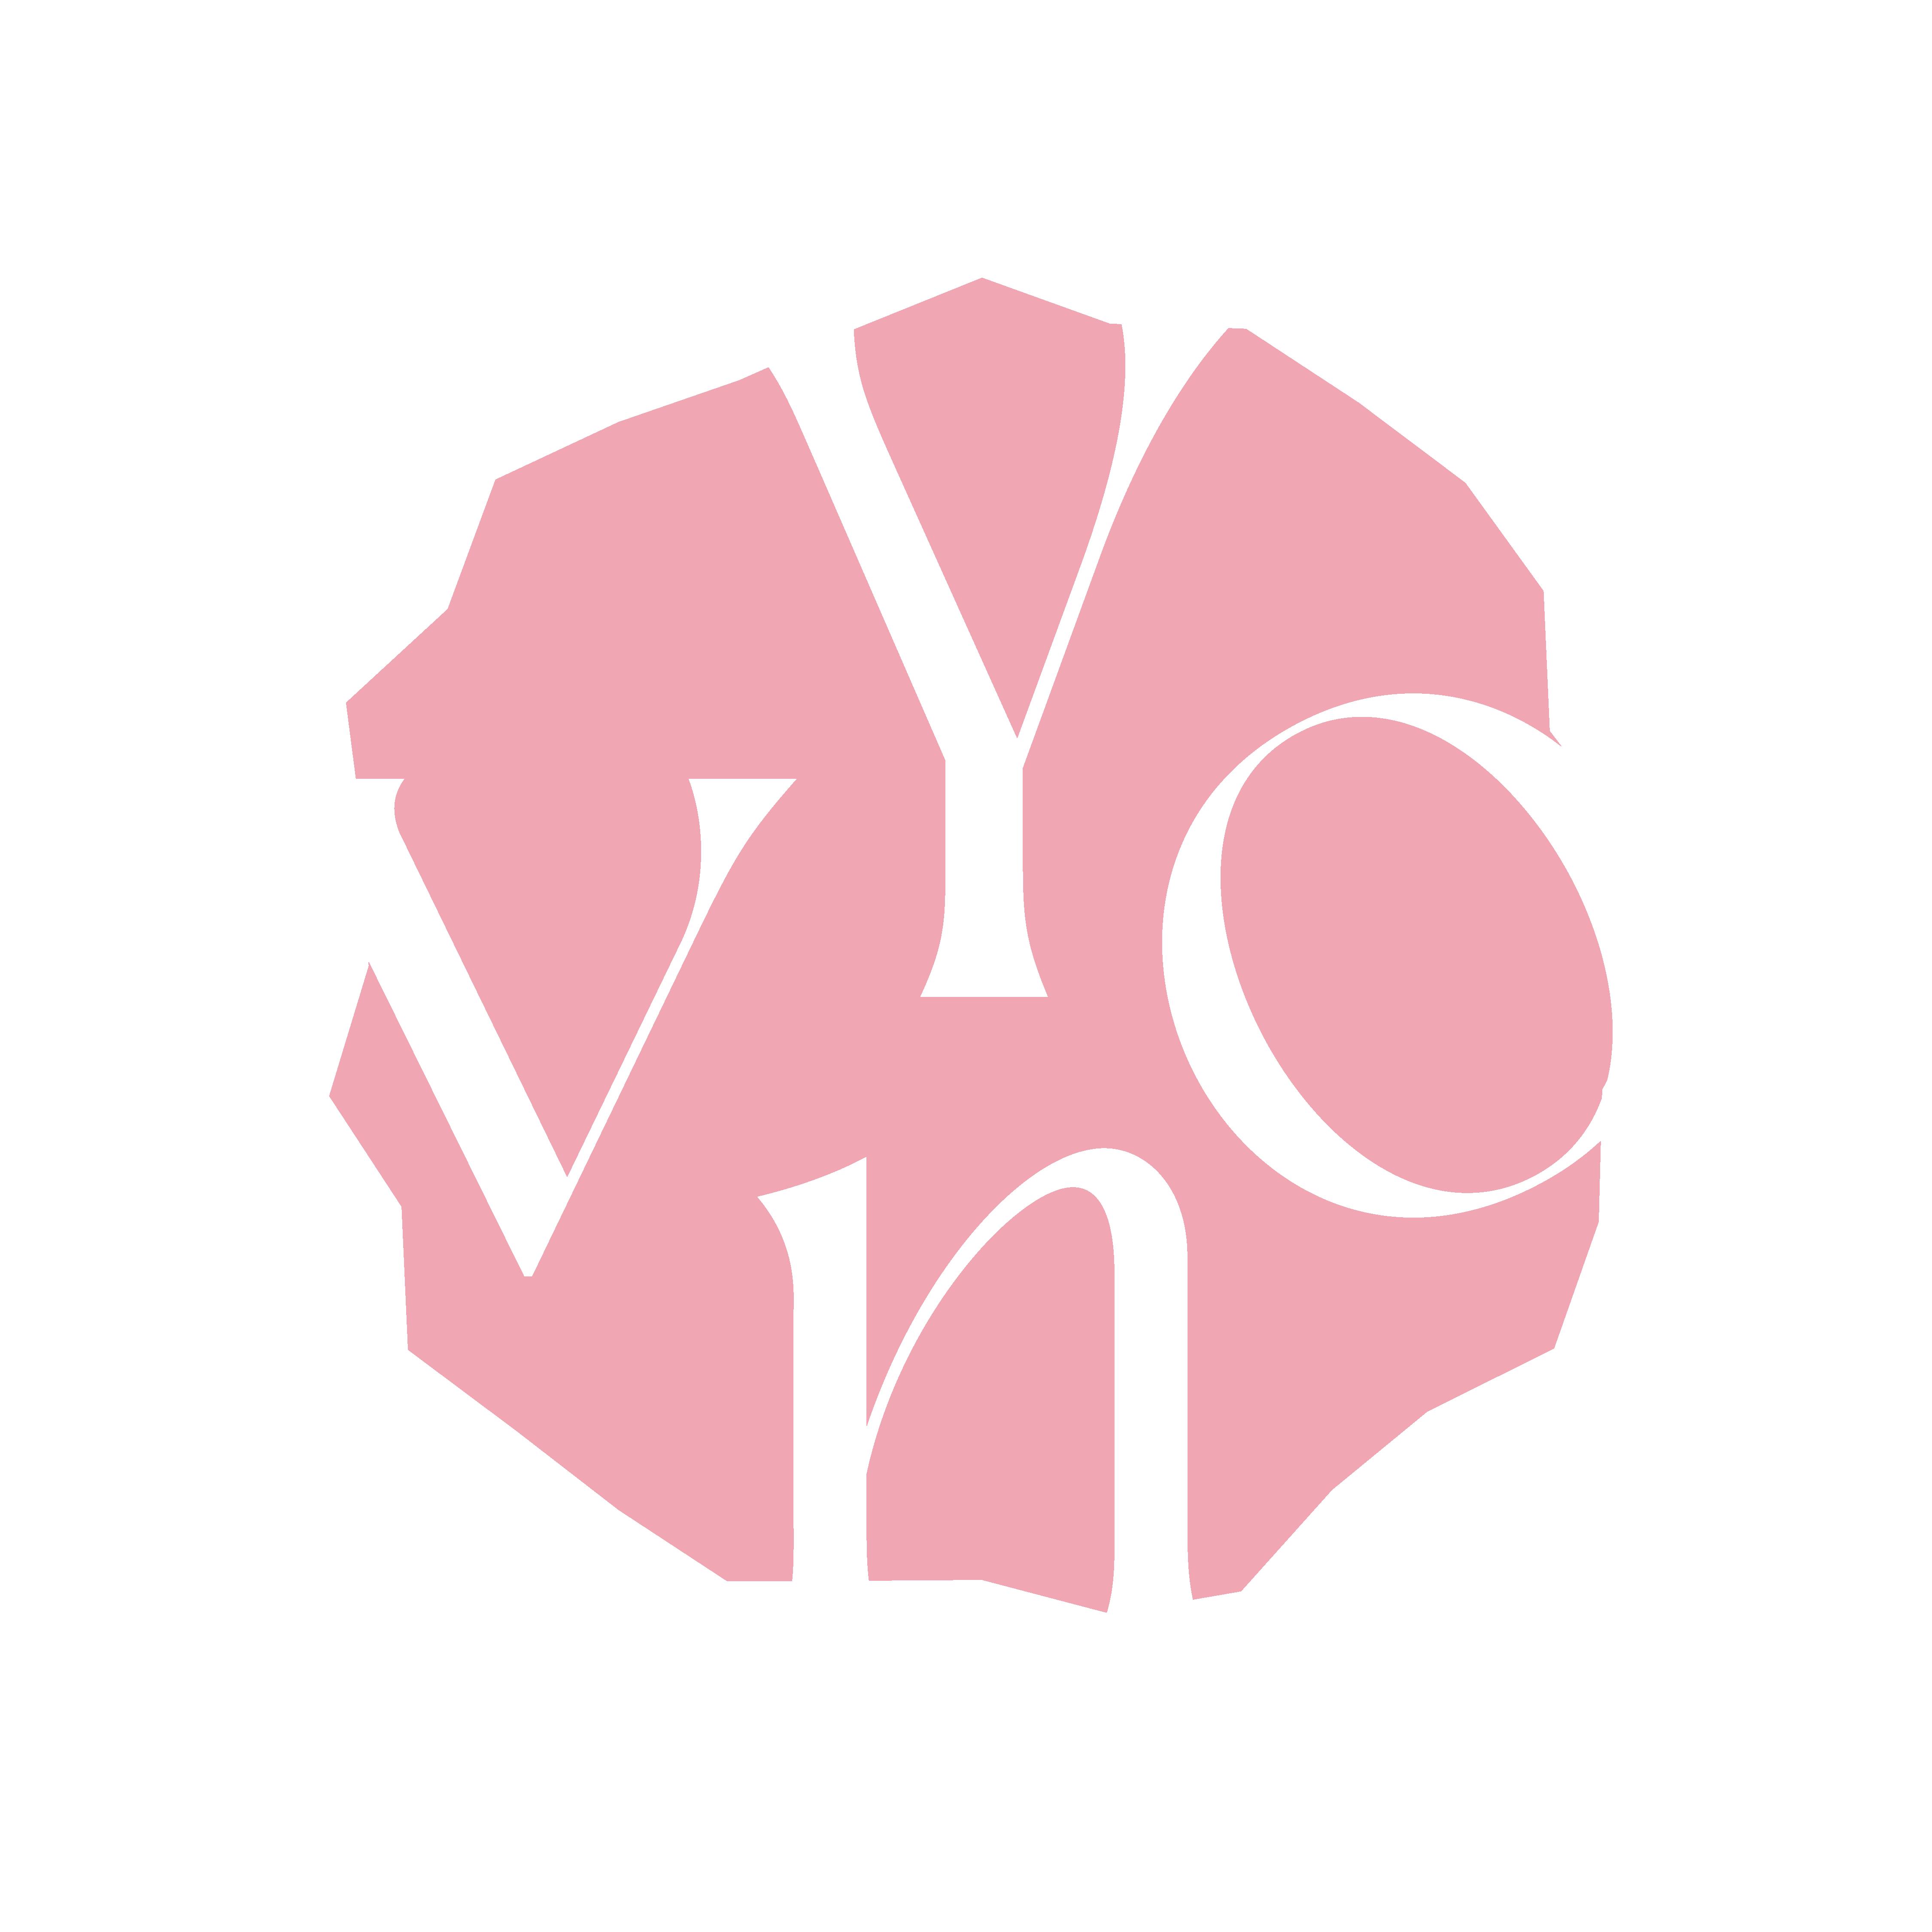 Logo Yvon van Bergen kunstenares intuïtief portret schilderen cursus lichtroze doux